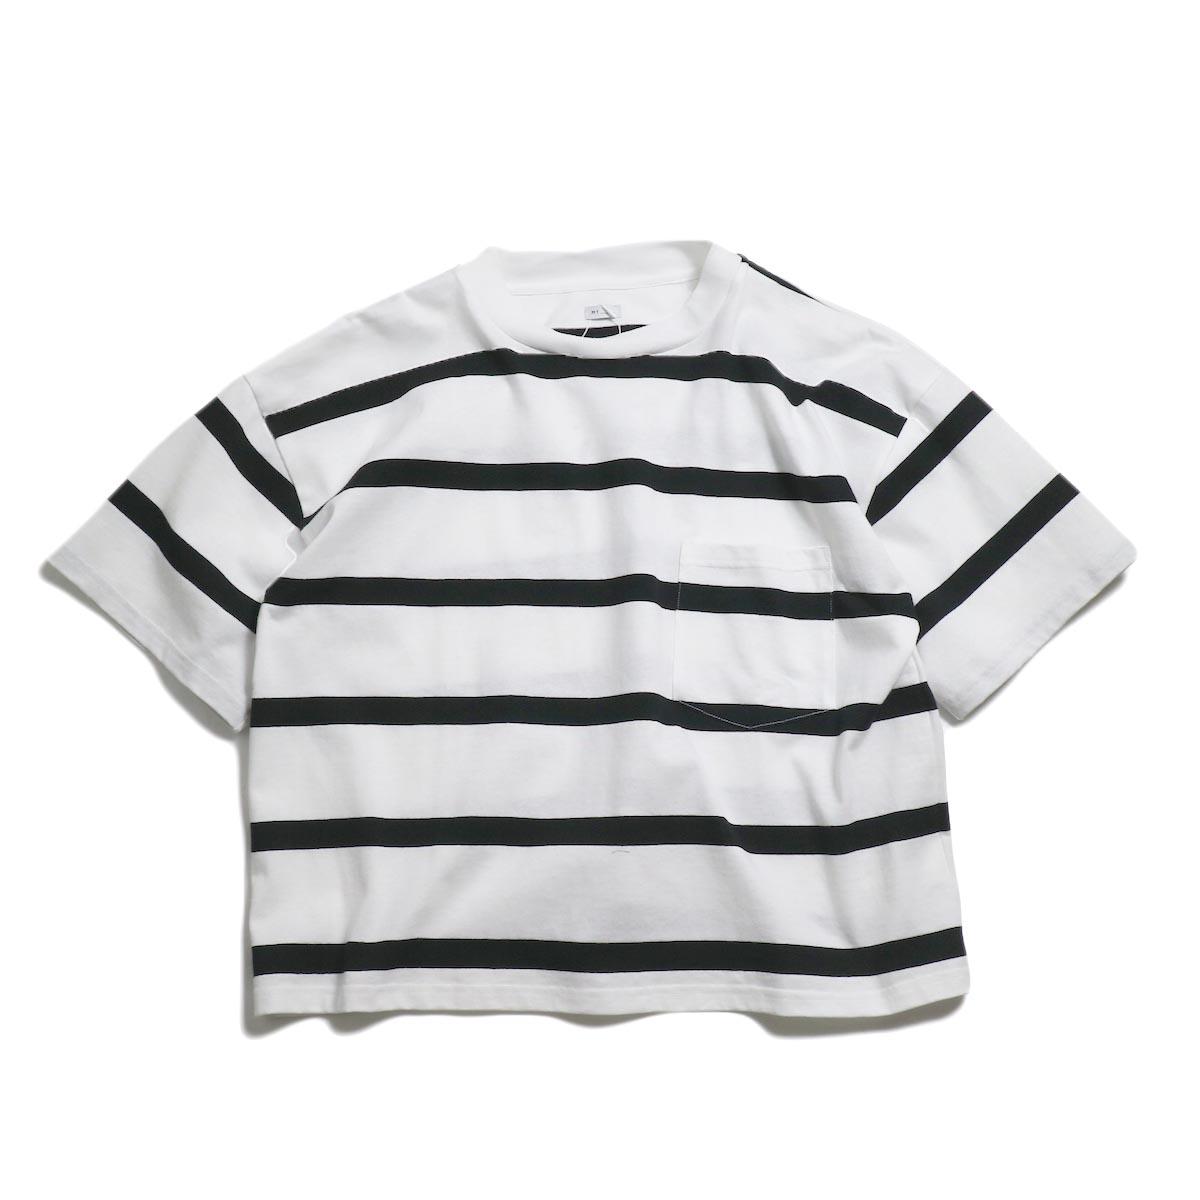 MY_ / Border Pocket T-Shirt -White